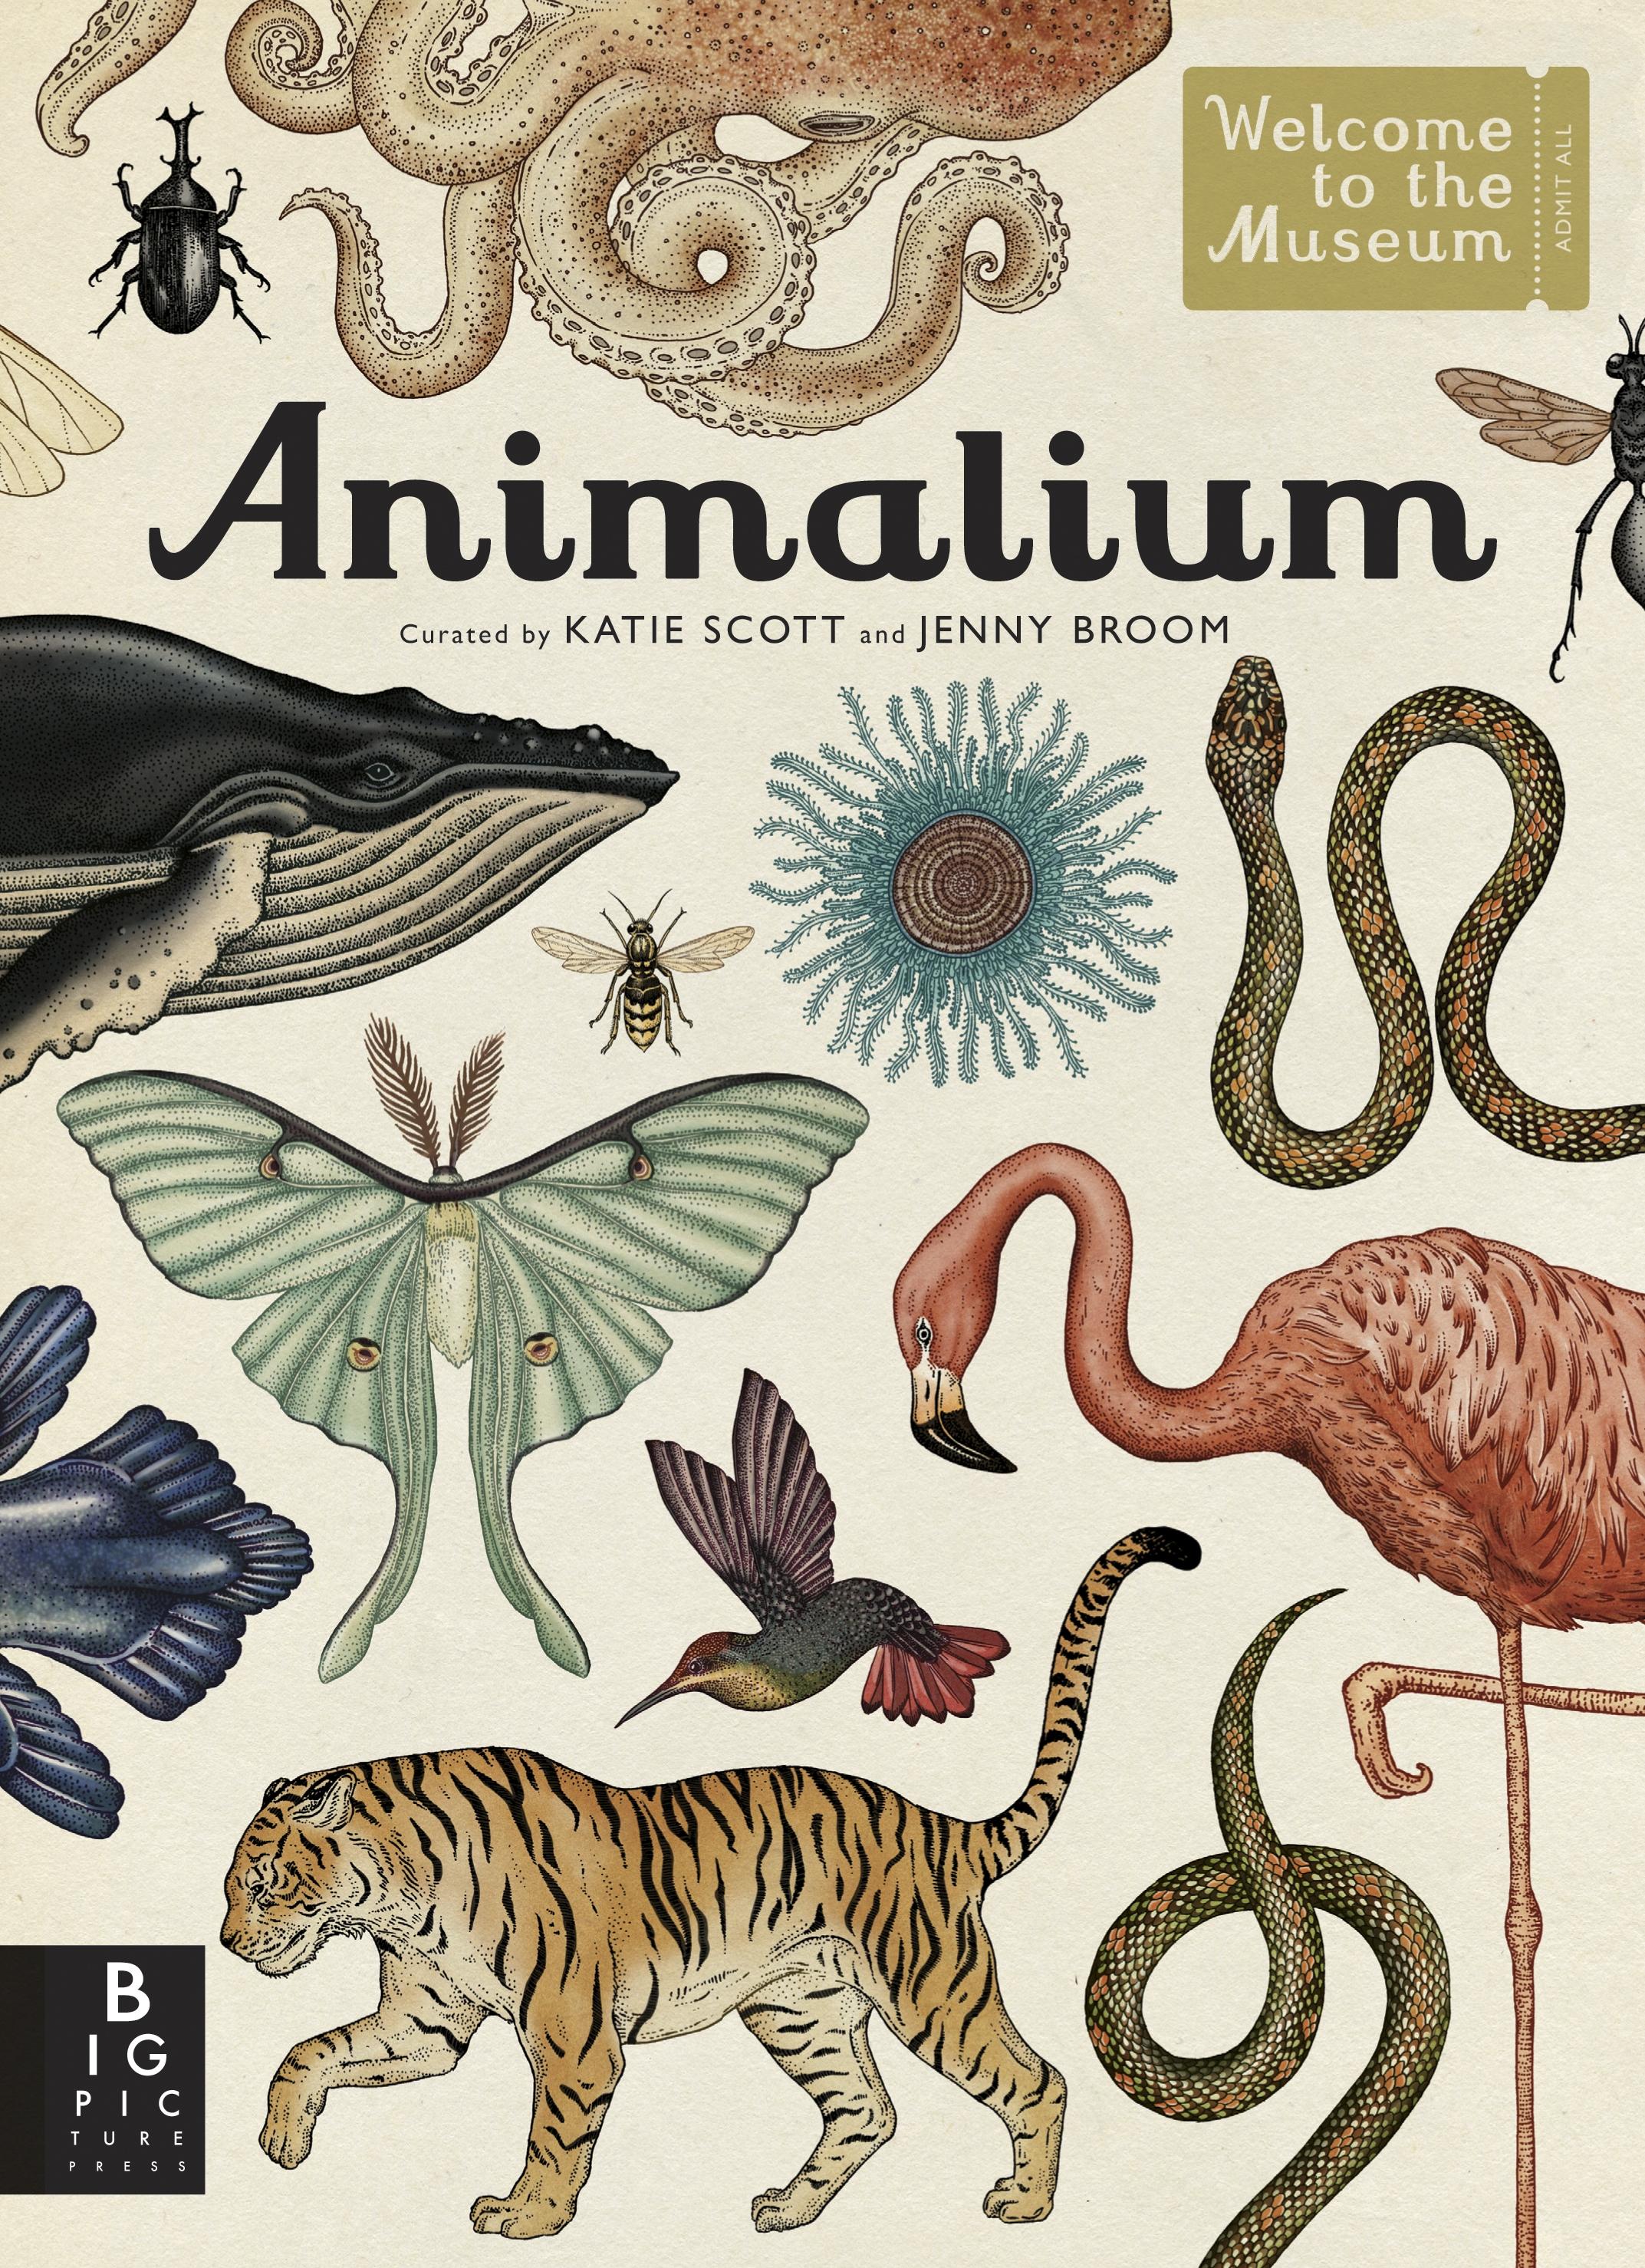 animalarium.jpg